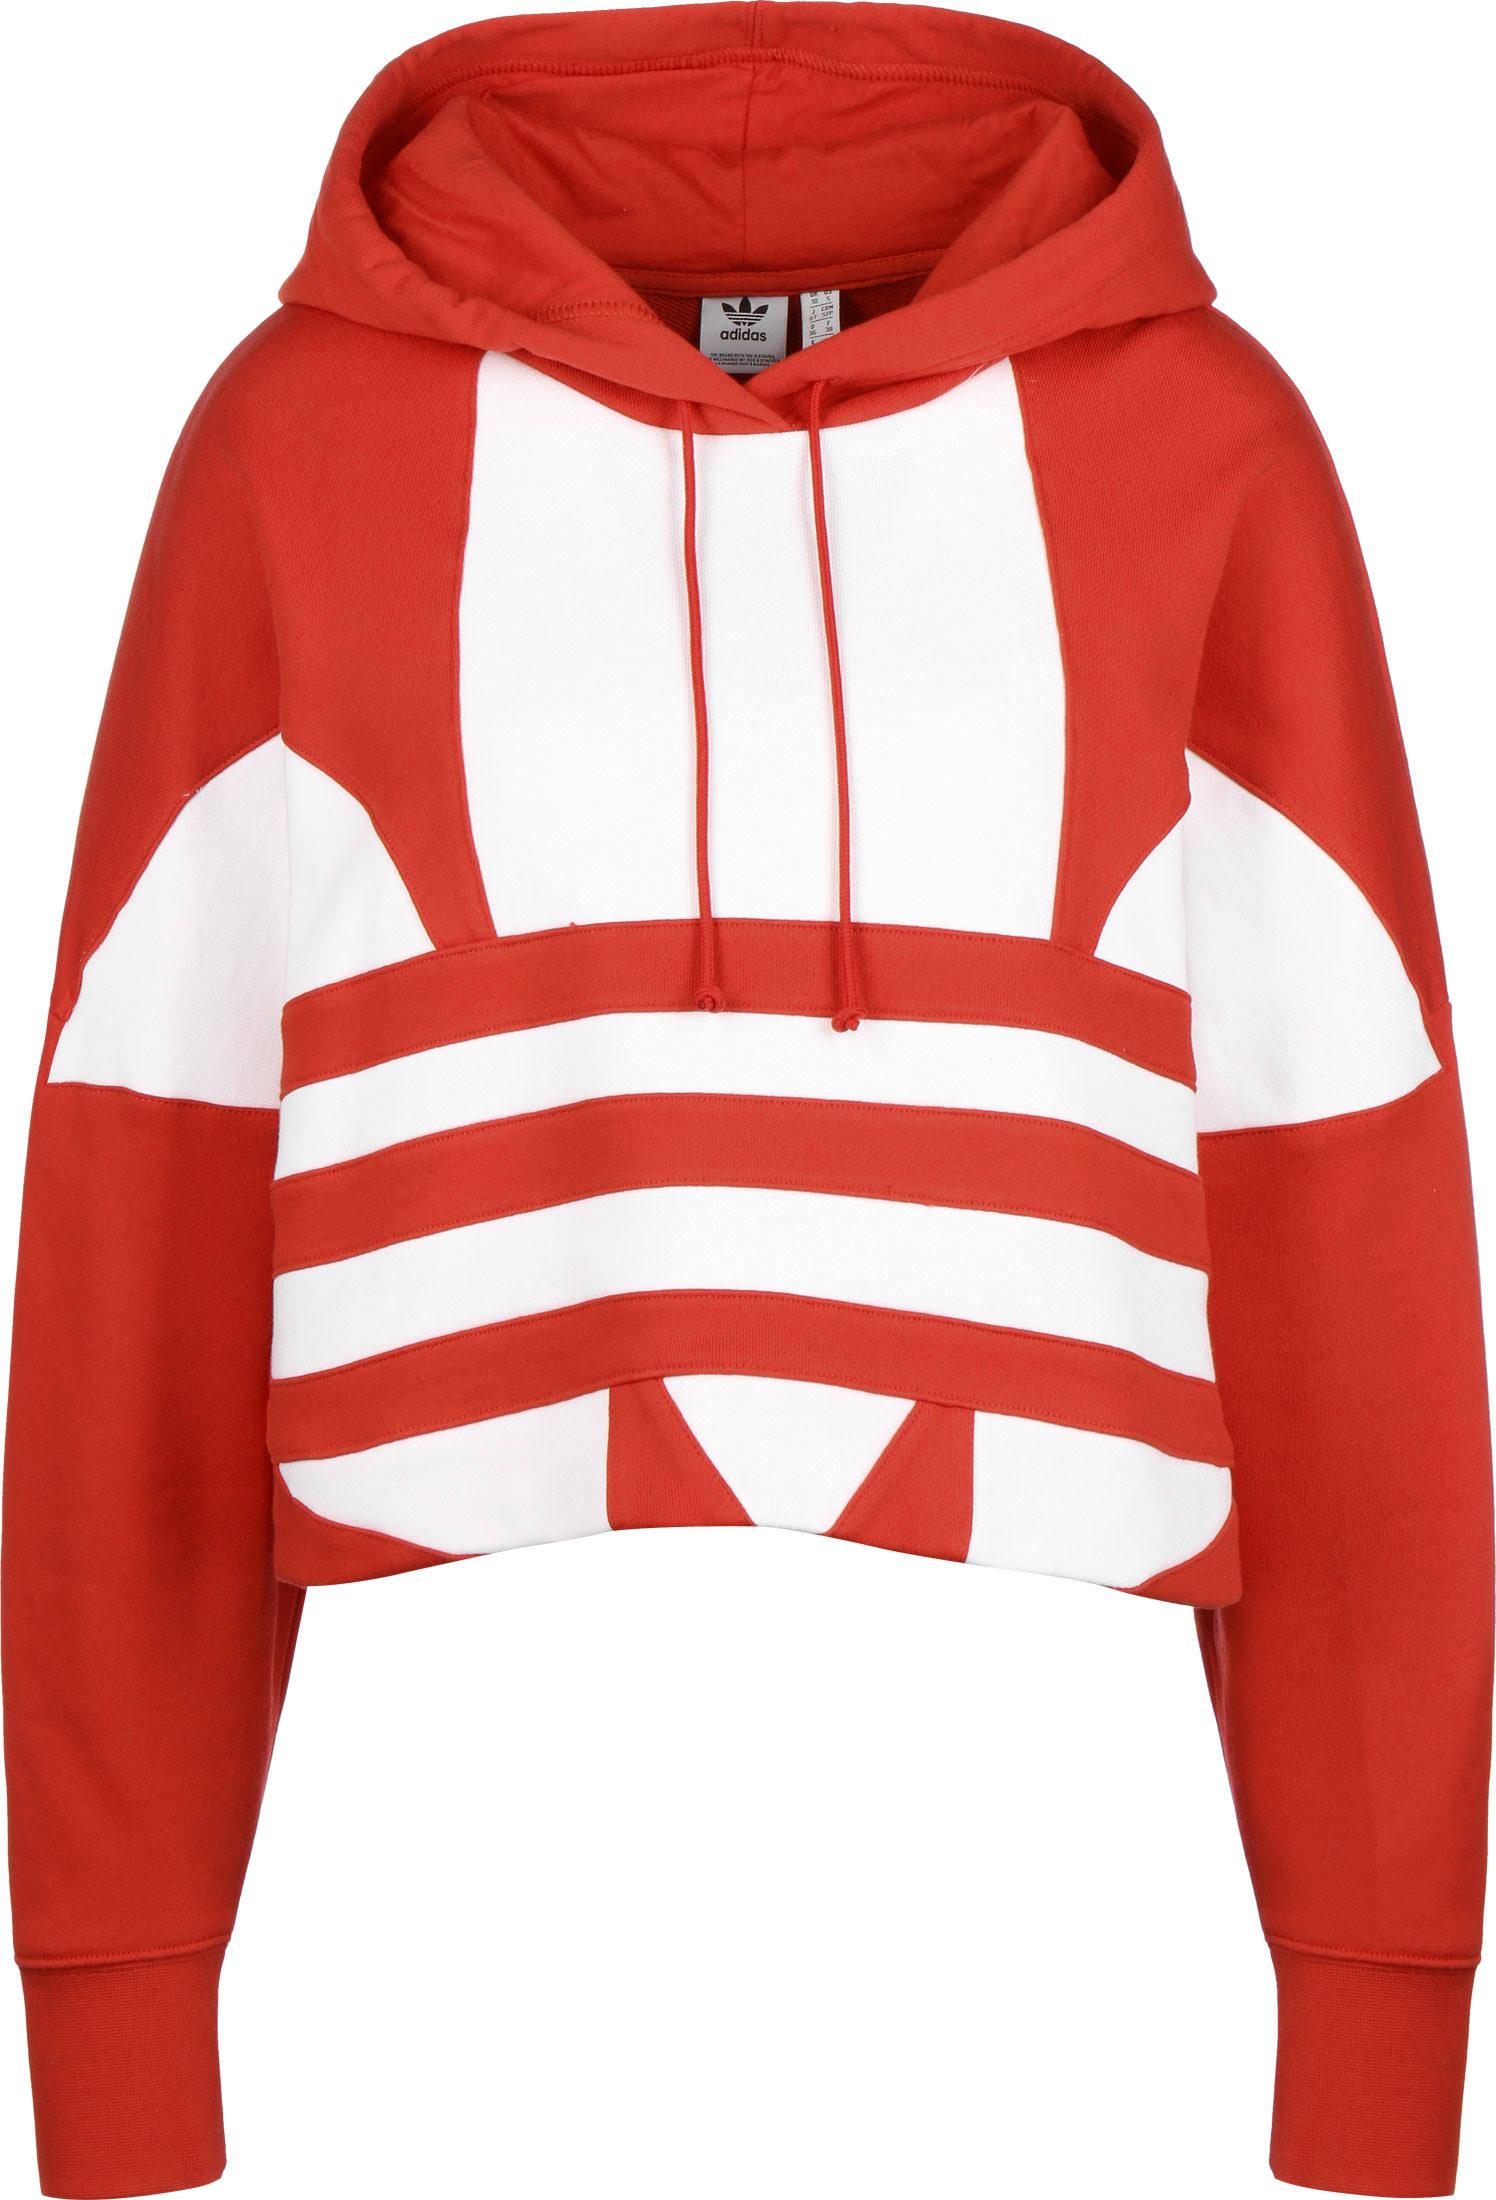 Adidas Originals 'Large Logo Crop' Hoodie